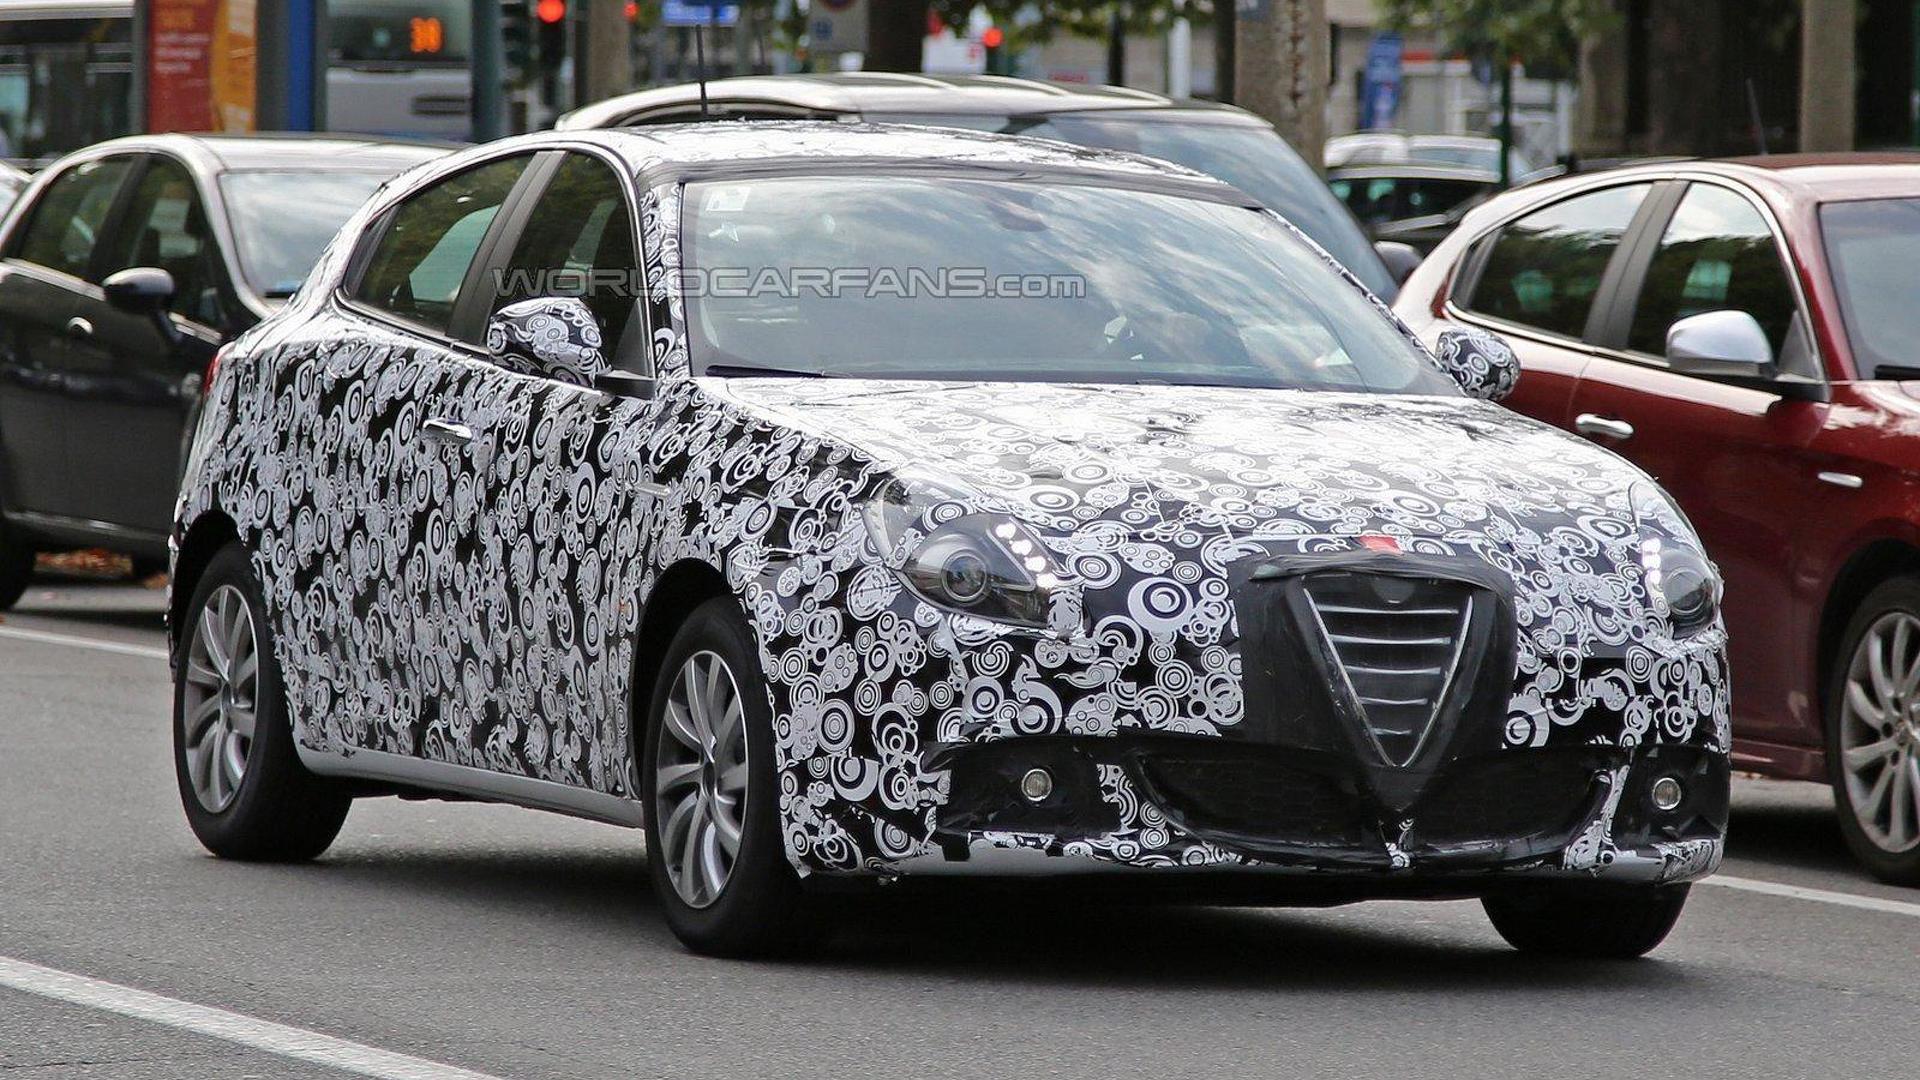 Alfa Romeo Giulietta facelift spied in Italy